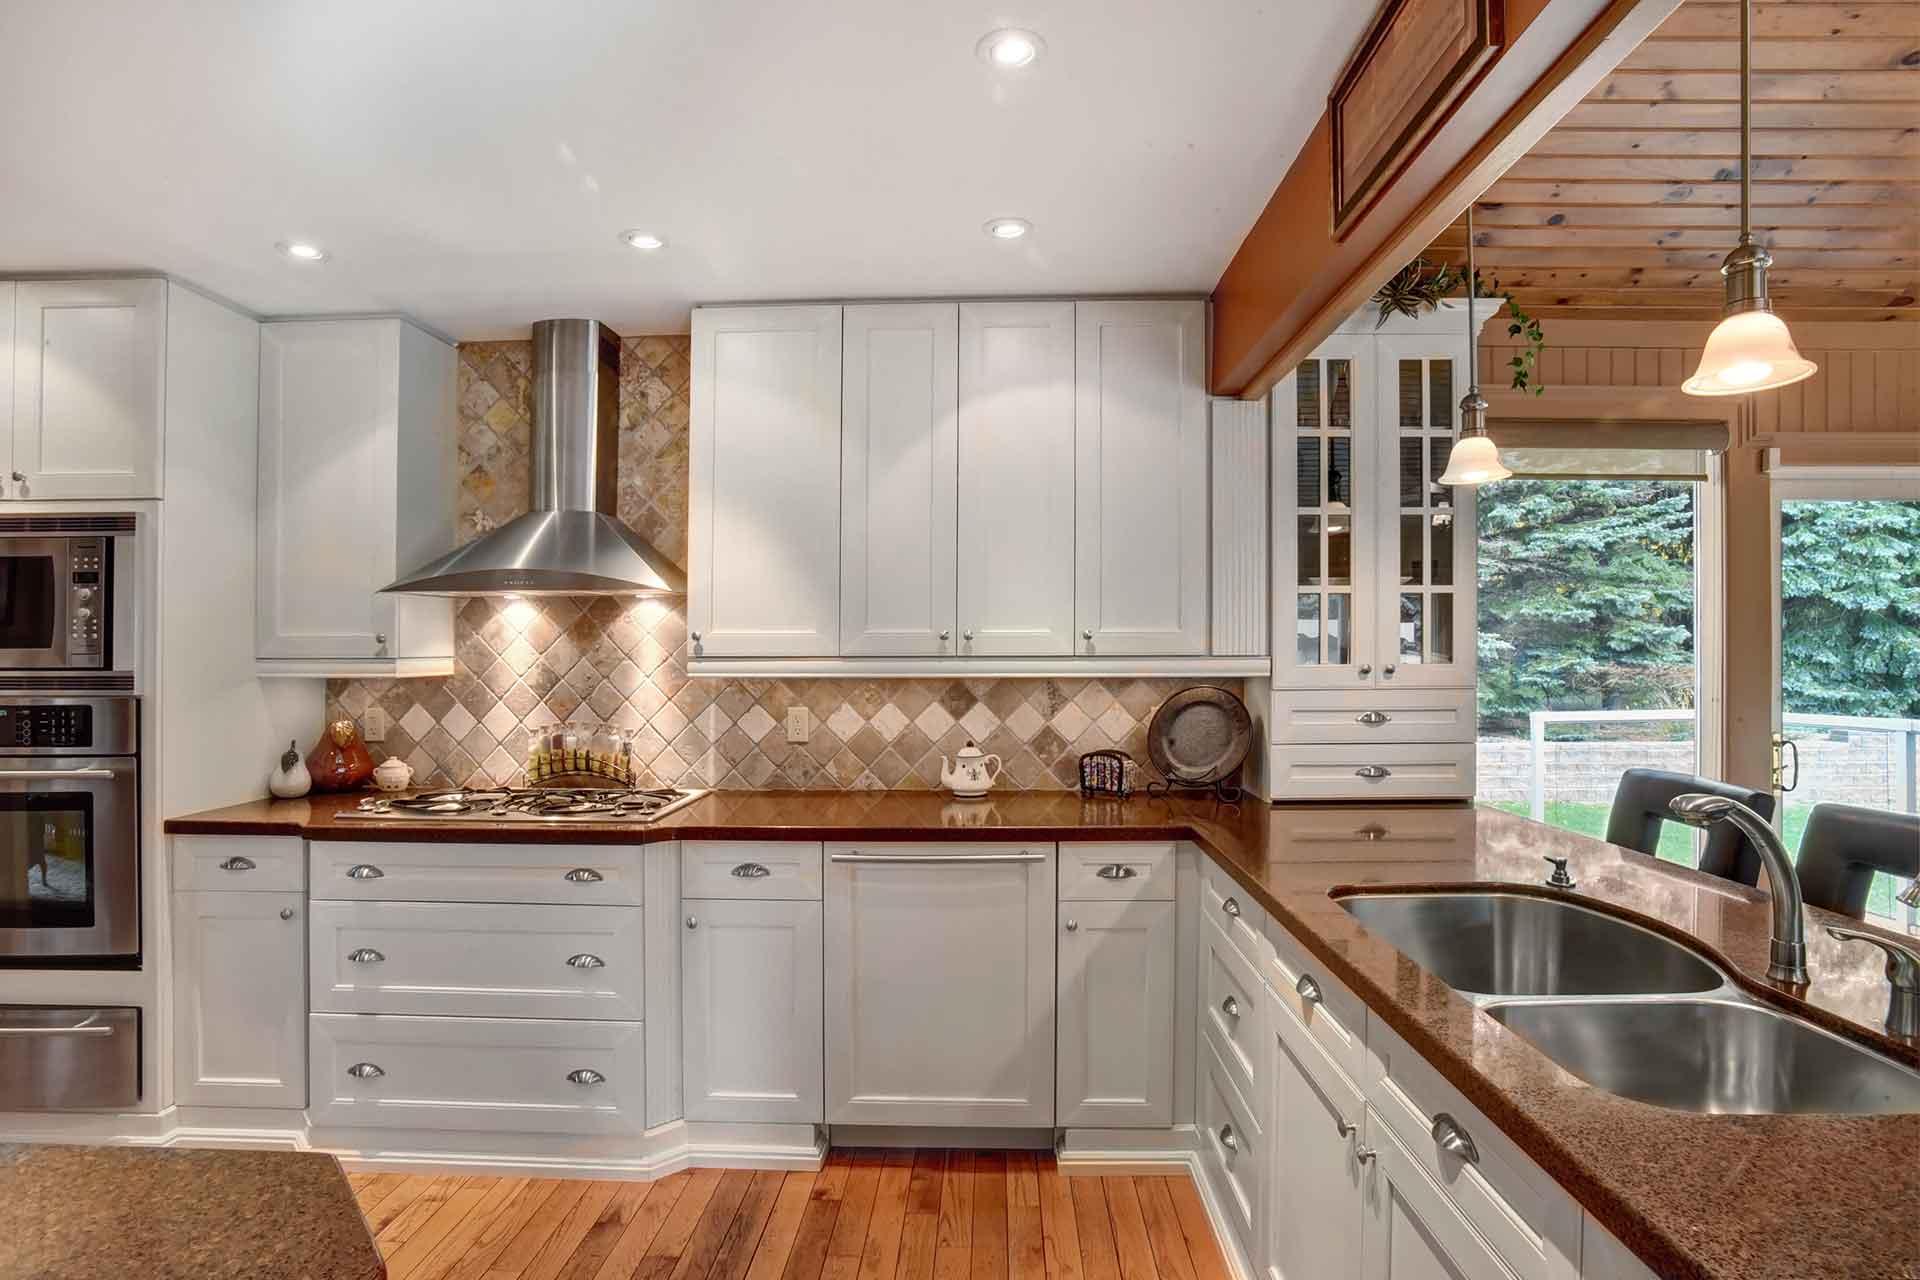 Kitchen, caesarstone countertops, pot lighting